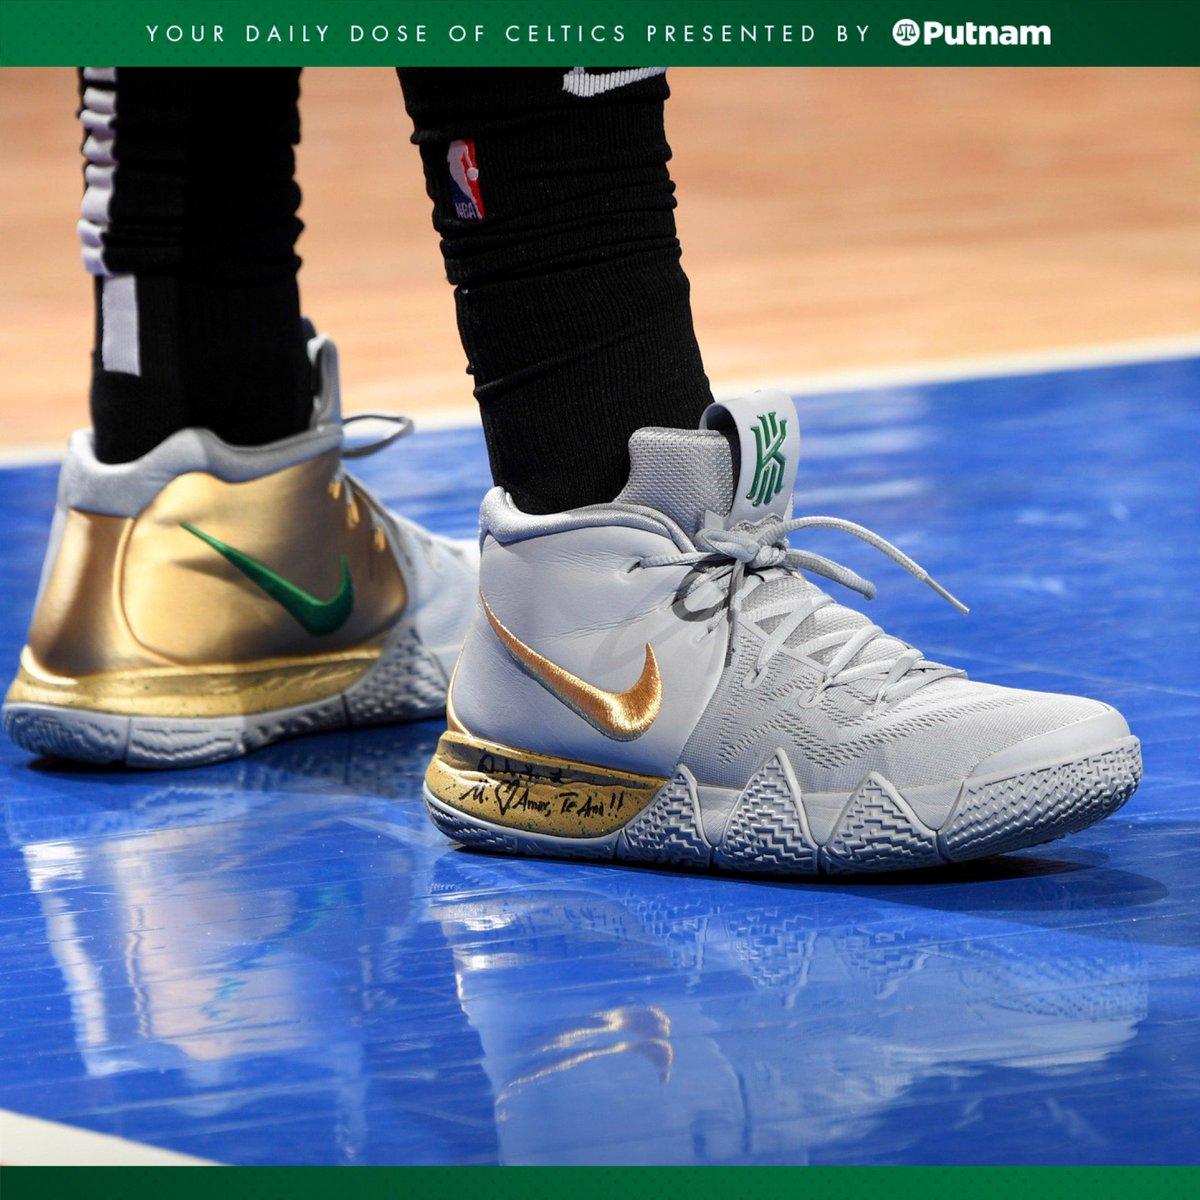 594c6990a ⚪💛☘  NBAKicks https   t.co MrMaDKf9Q2 - Basketball - Boston ...